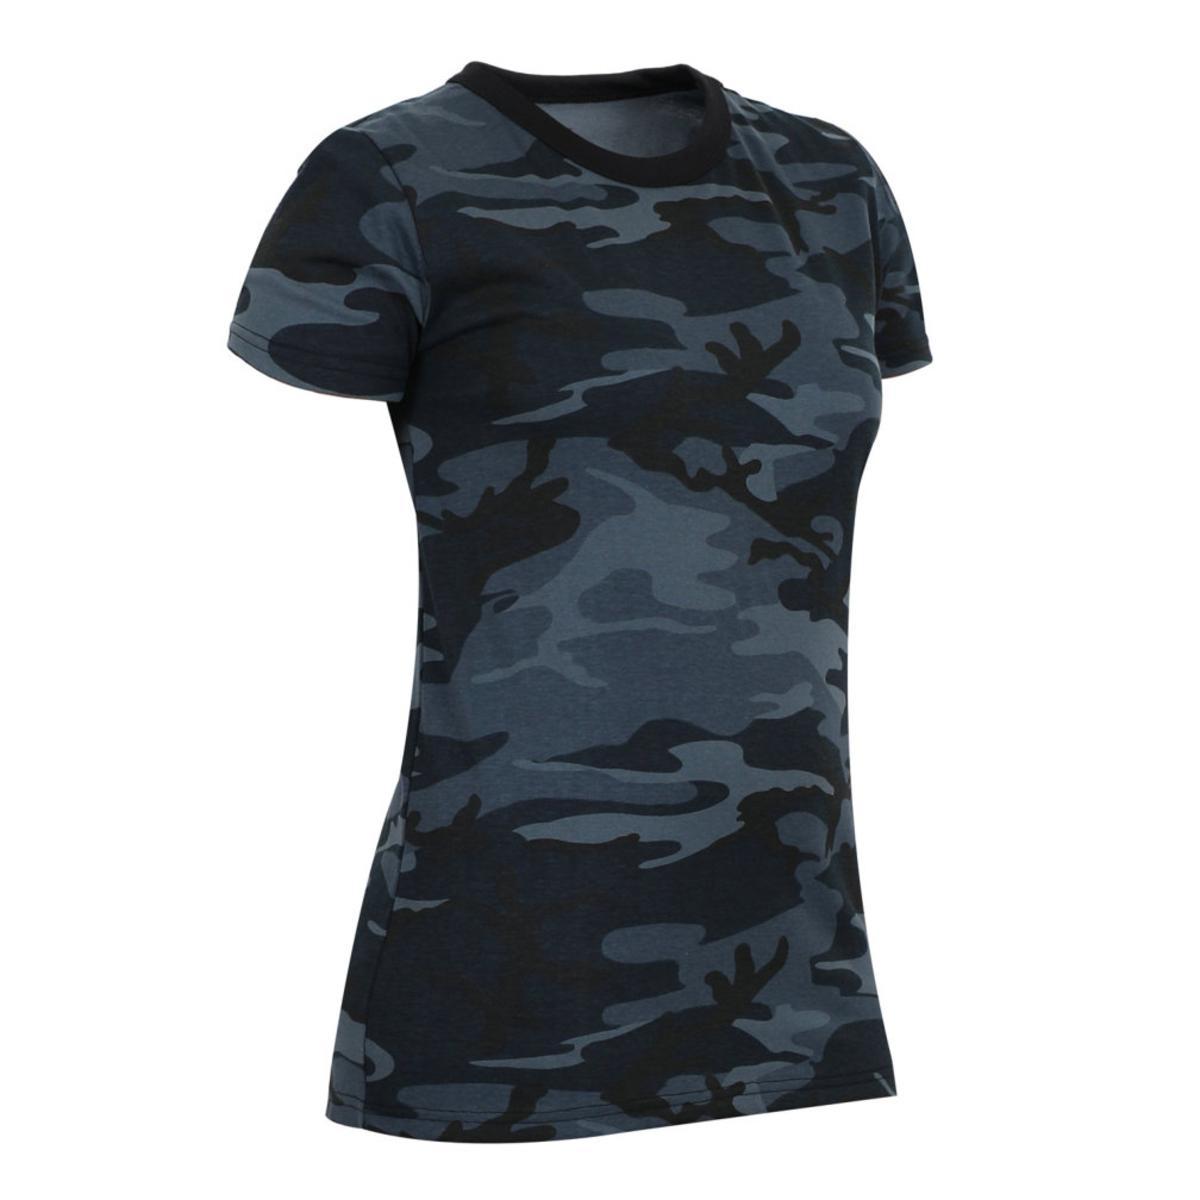 541b397f ... Rothco Womens Long Length Camouflage T Shirt Midnight Blue Camo eBay